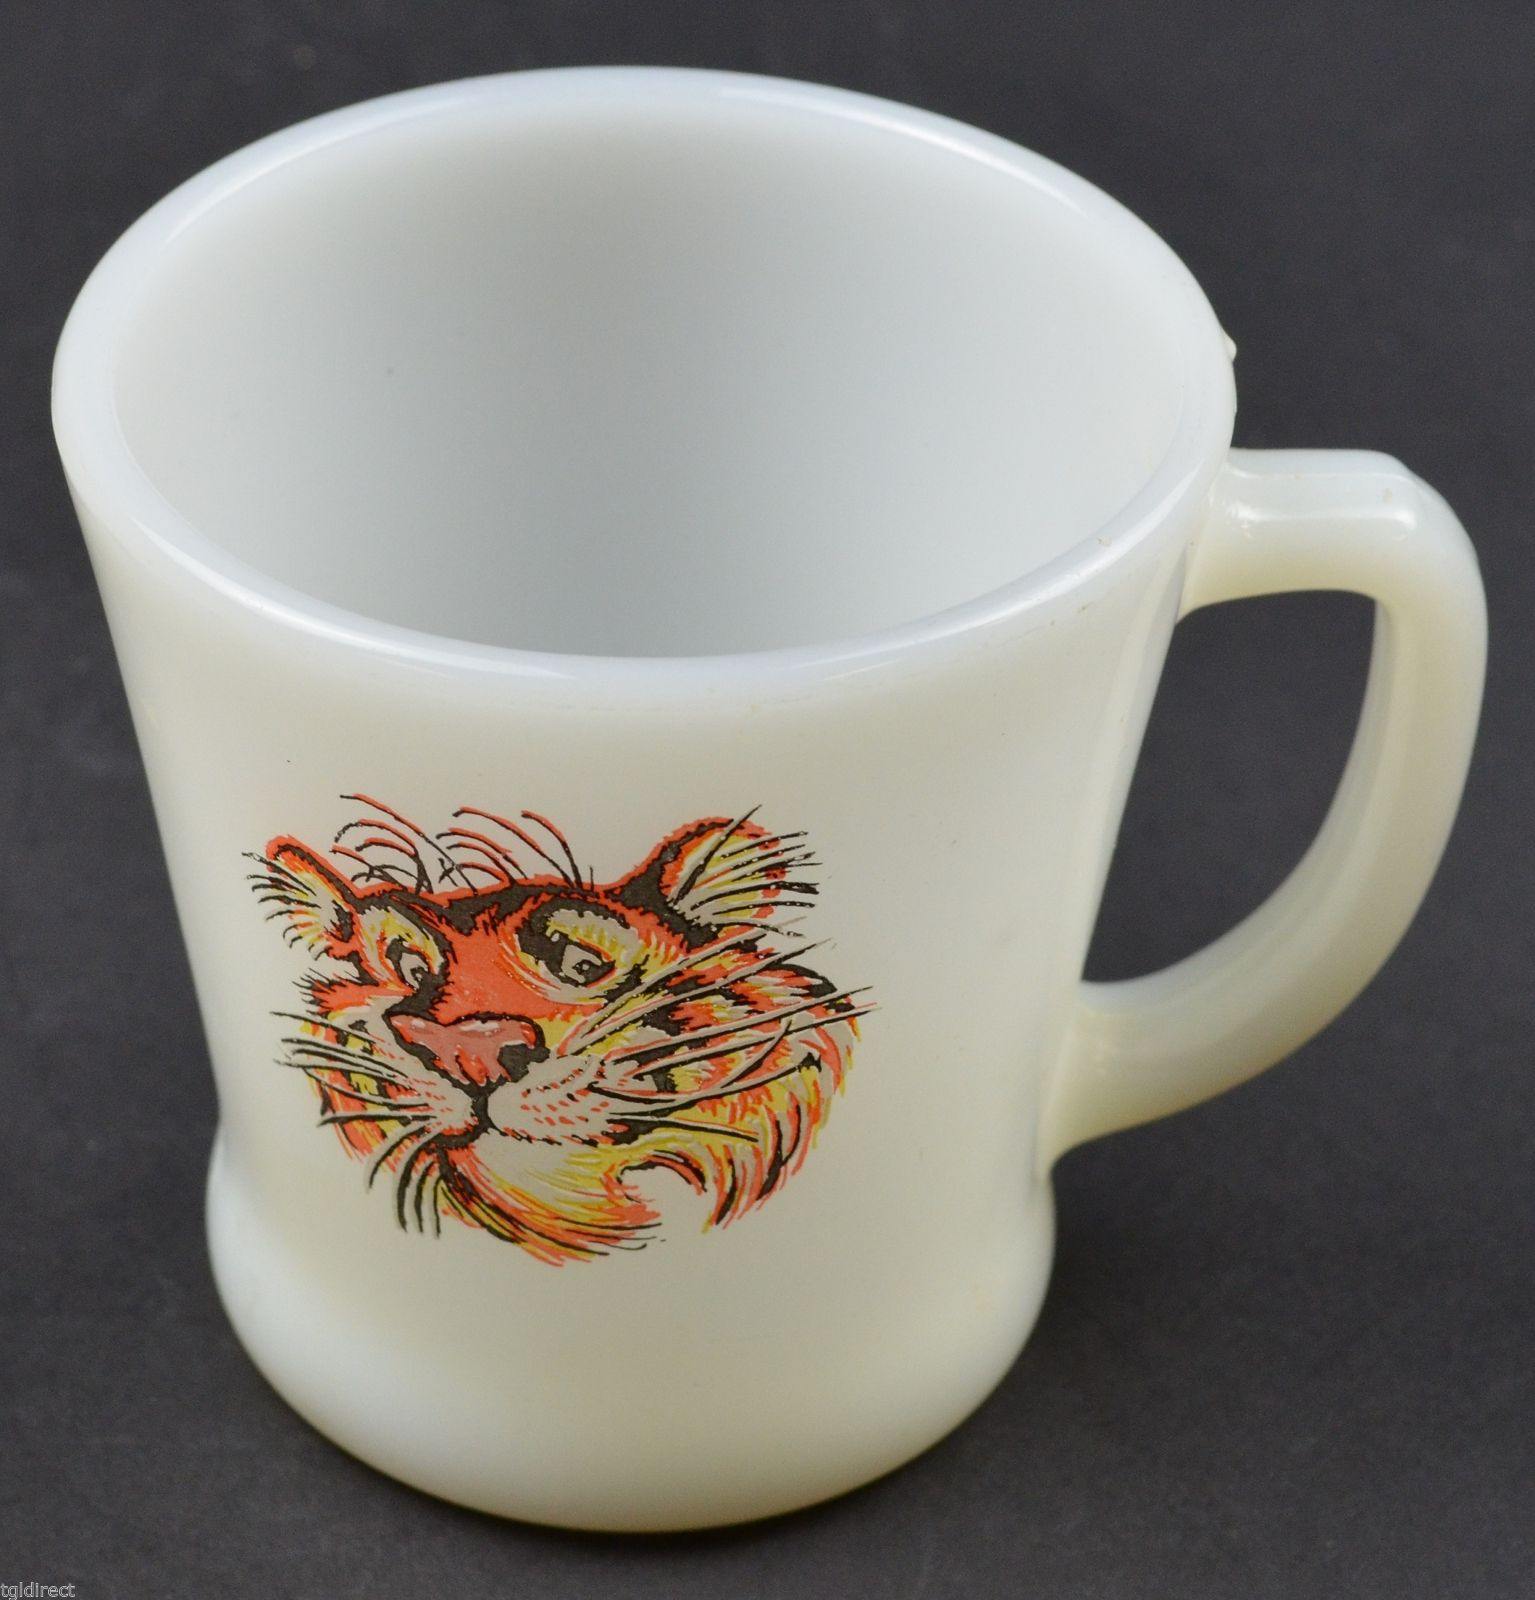 166a69ede74 Anchor Hocking Fire King Mug Esso Tiger Pattern 3.375